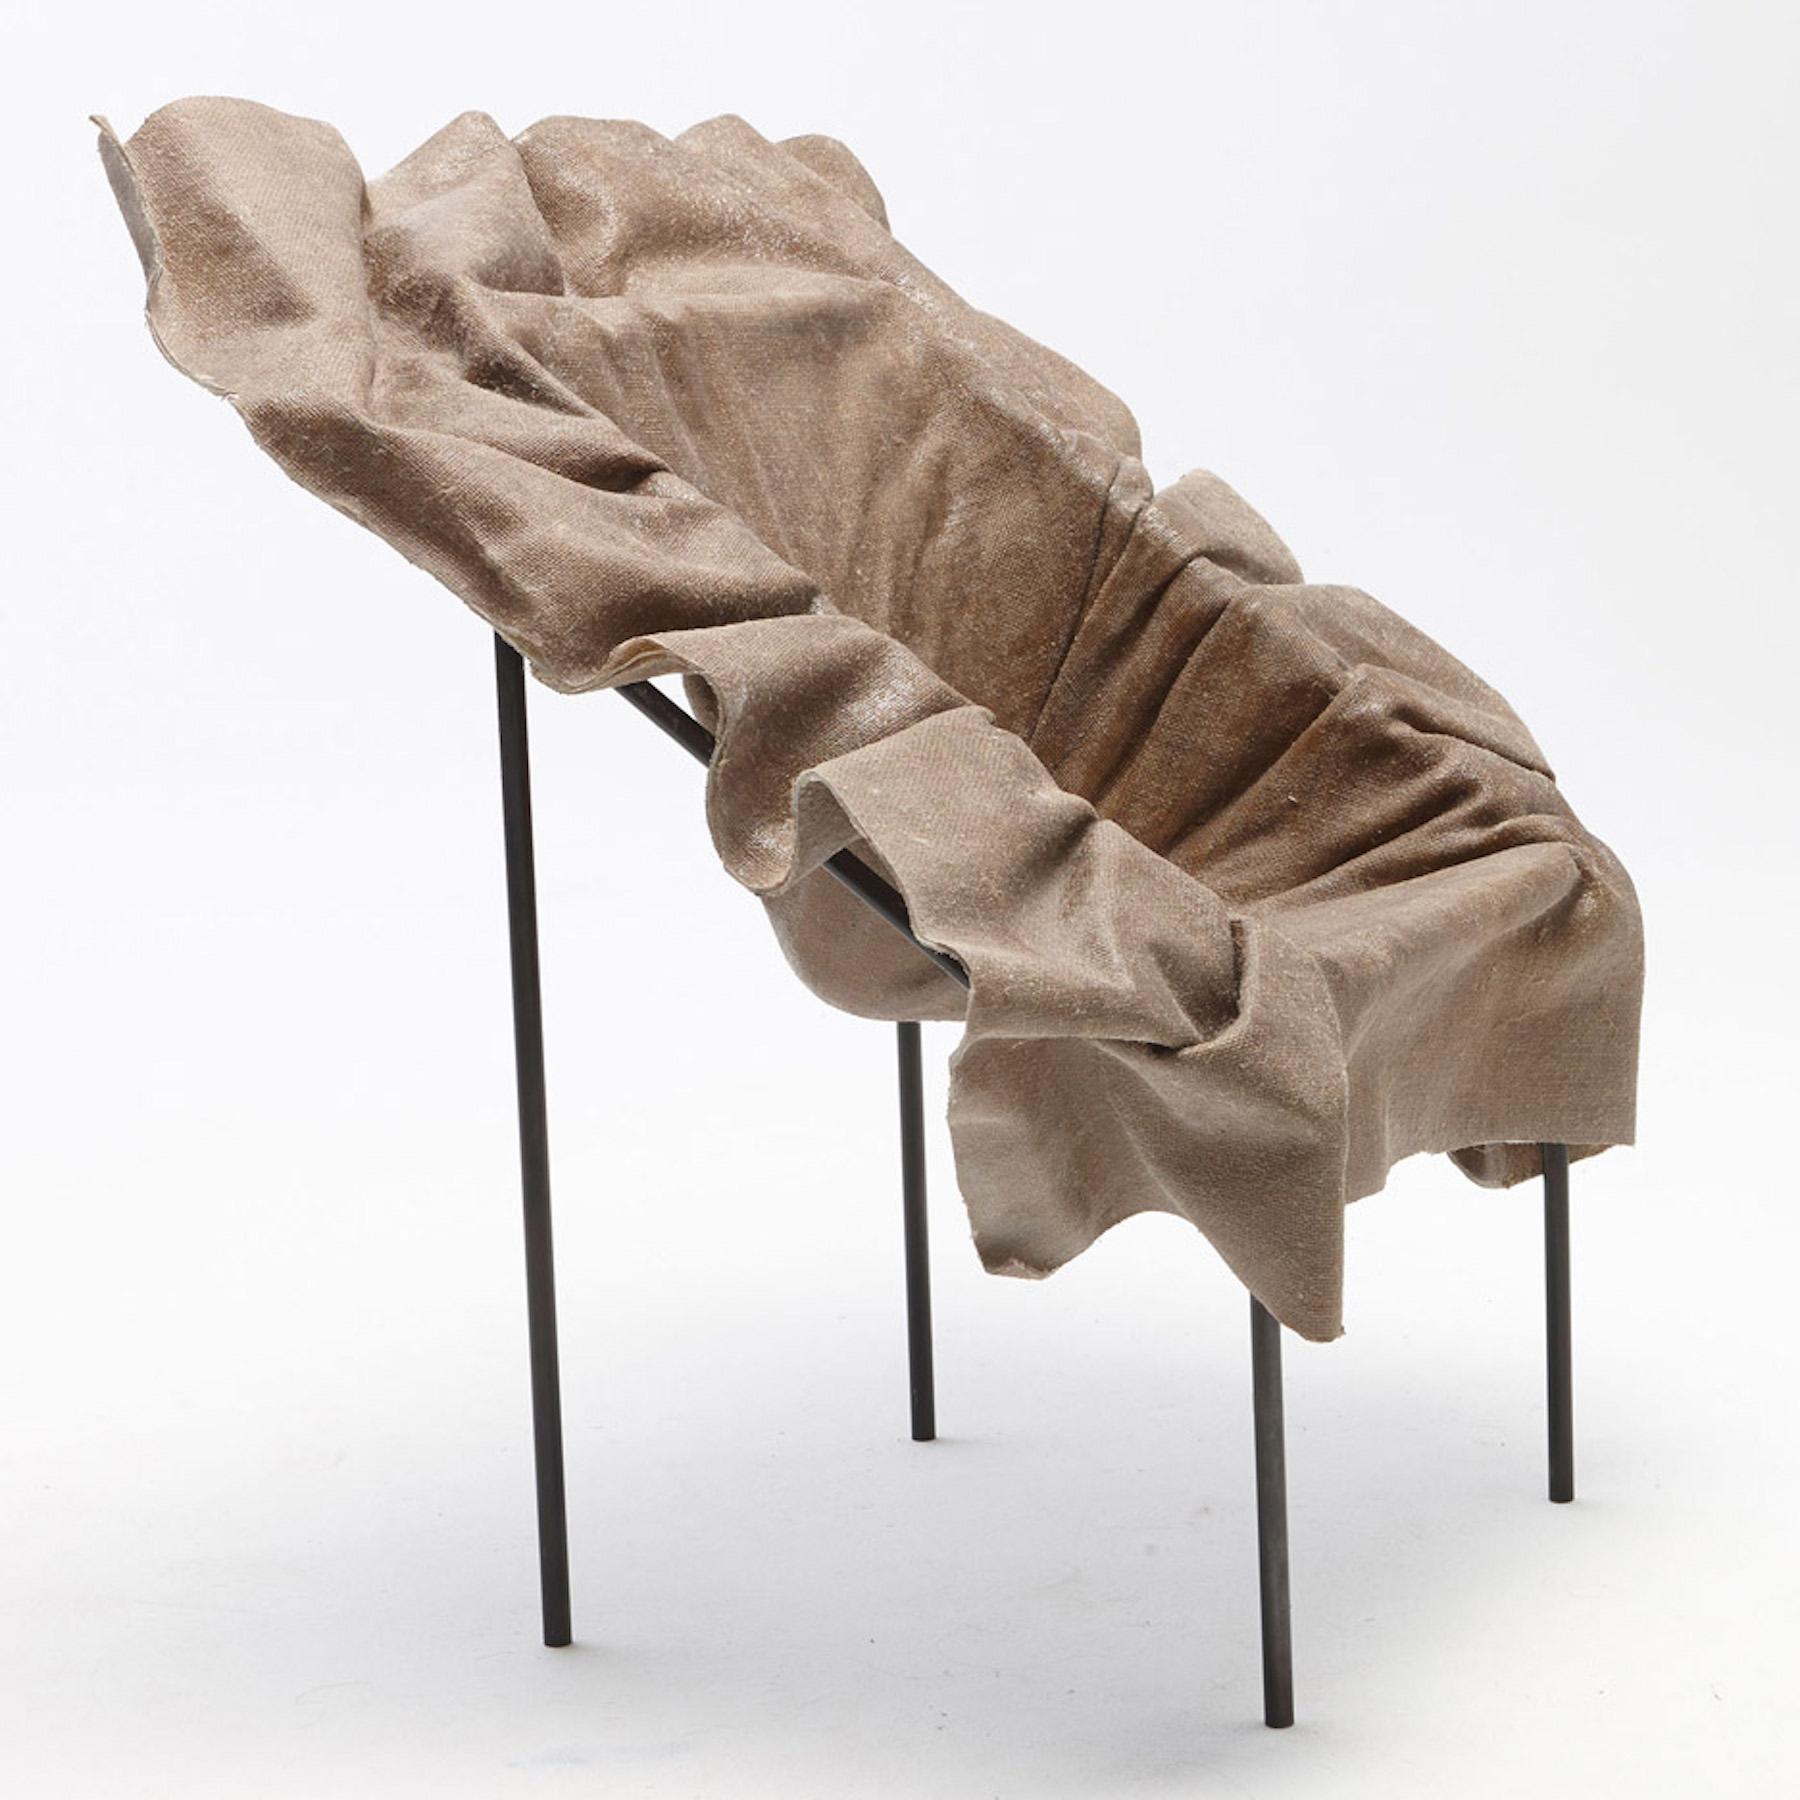 iGNANT-Design-Demeter-Fogarasi-Poetic-Furniture-Frozen-Textiles-05